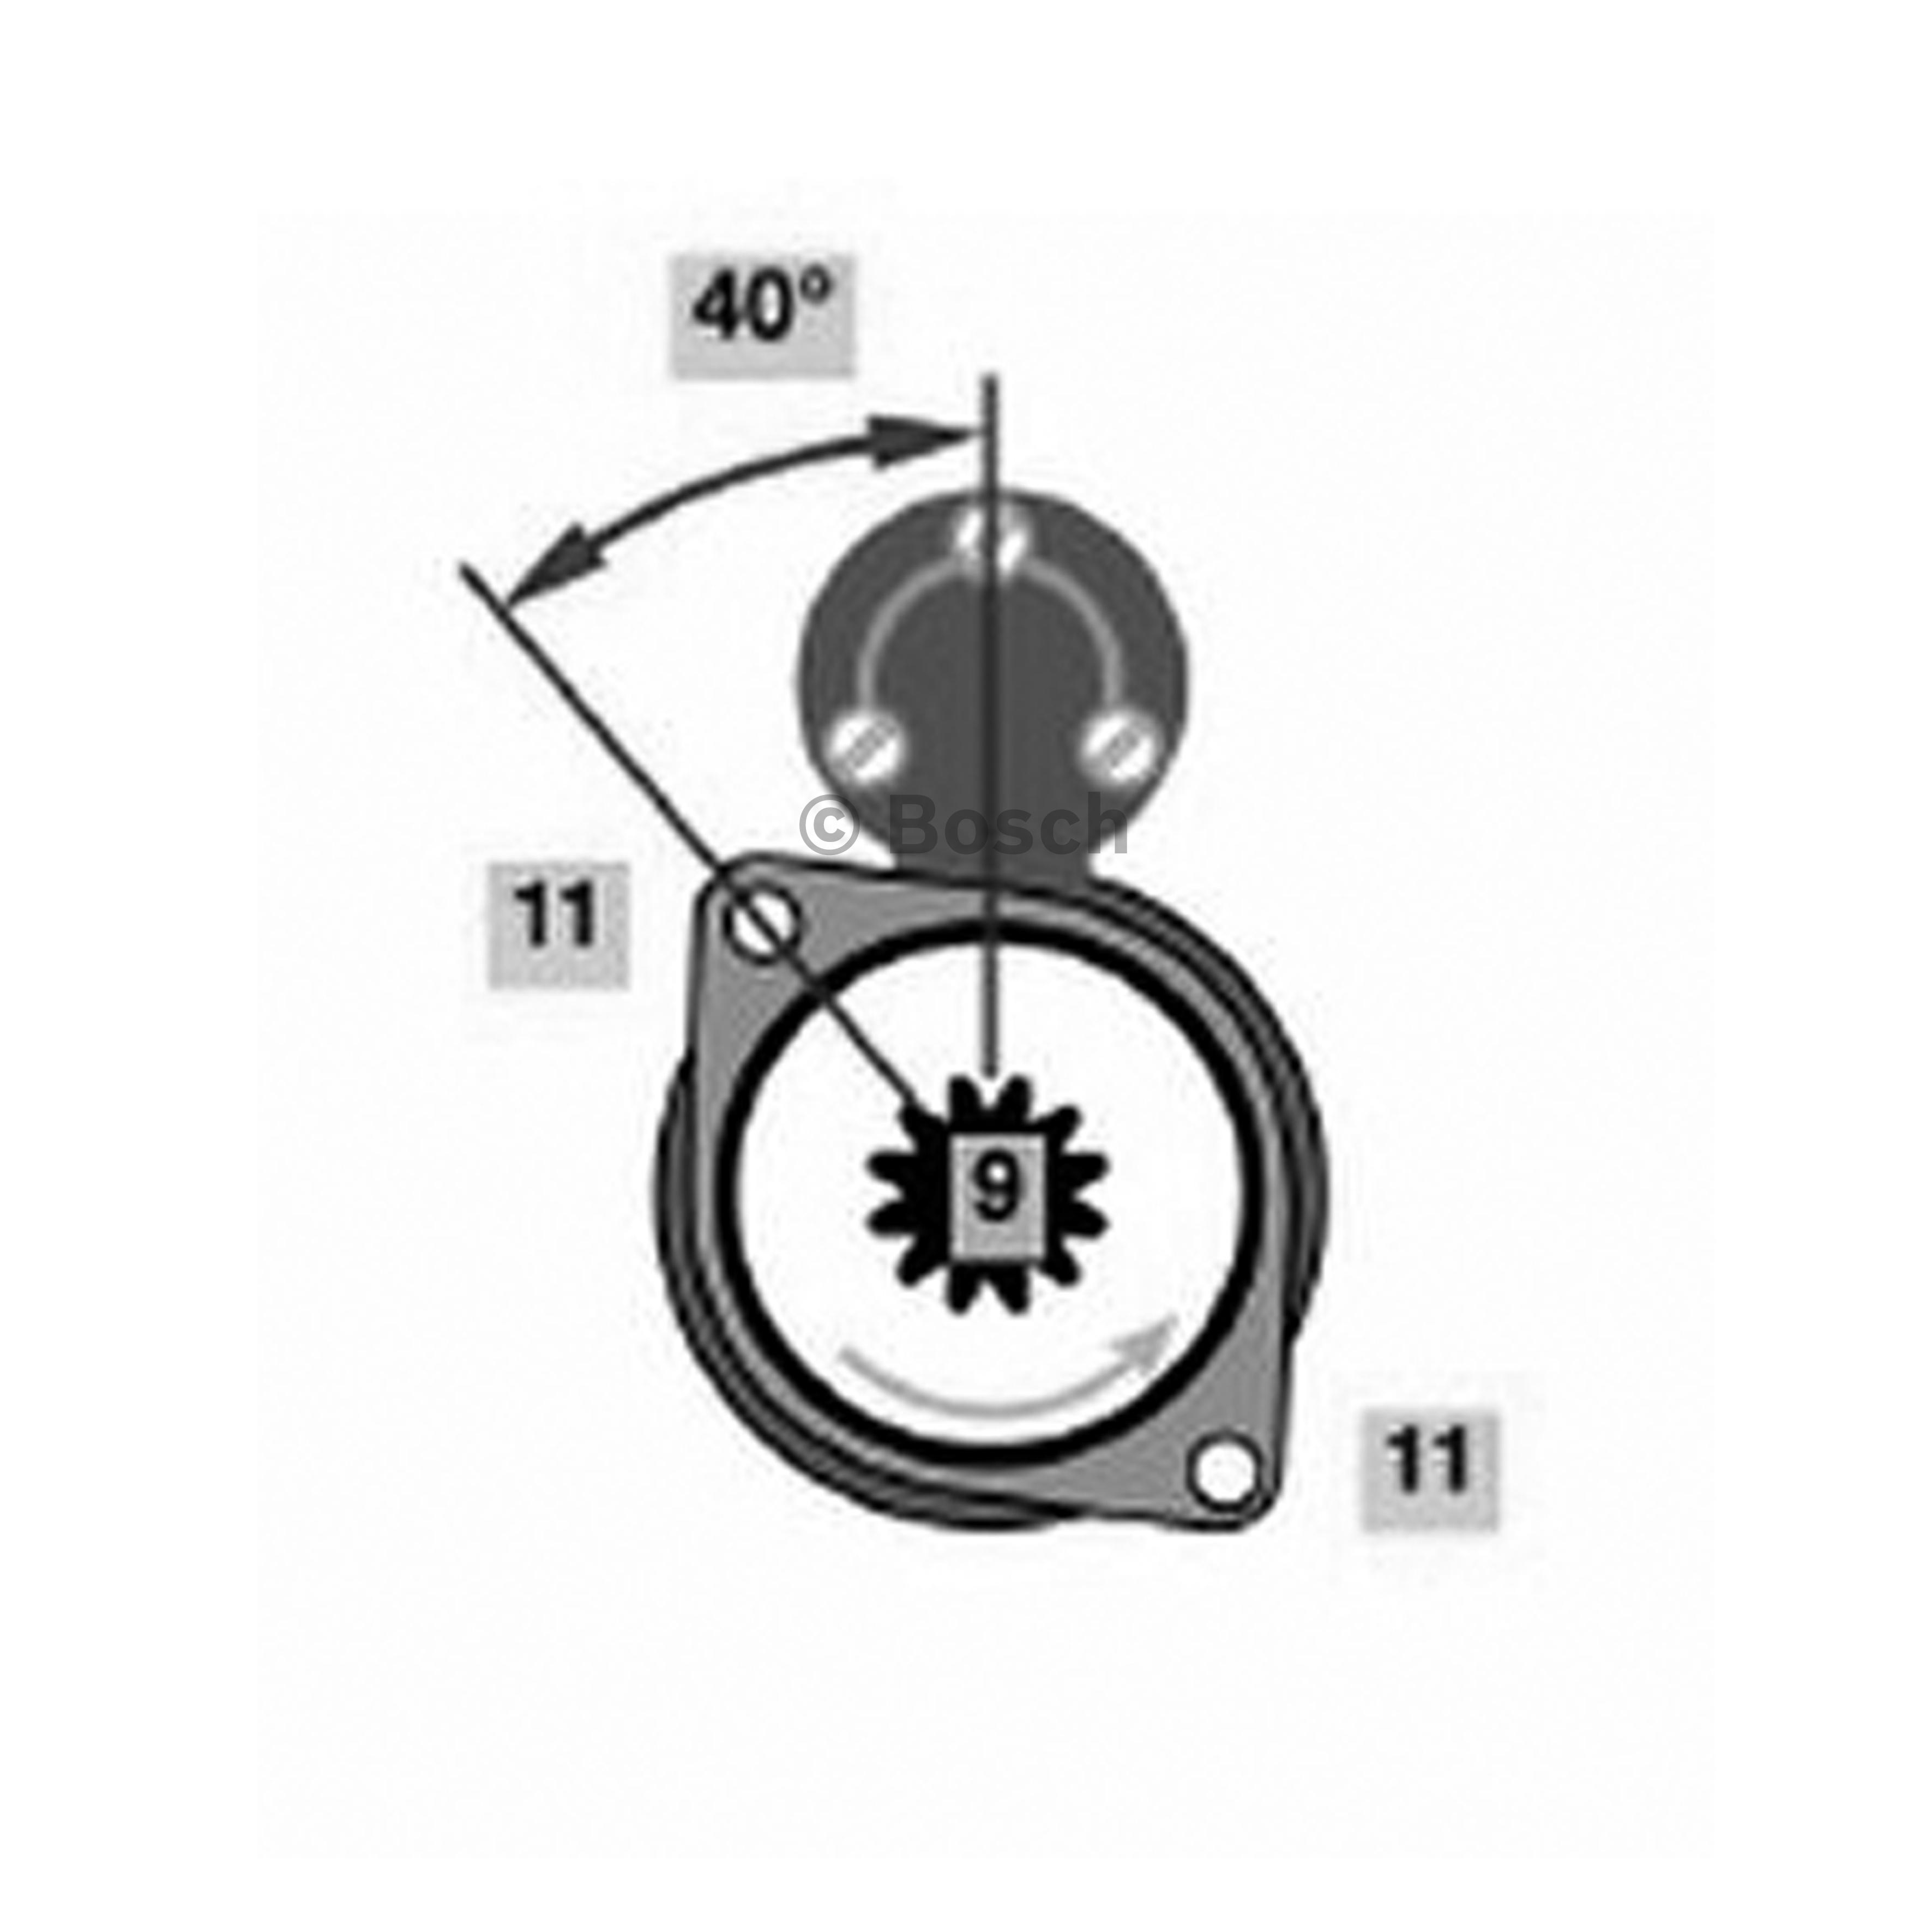 BOSCH Starter Motor 0 001 110 133 fits Volkswagen Transporter/Caravelle 2.4 D...